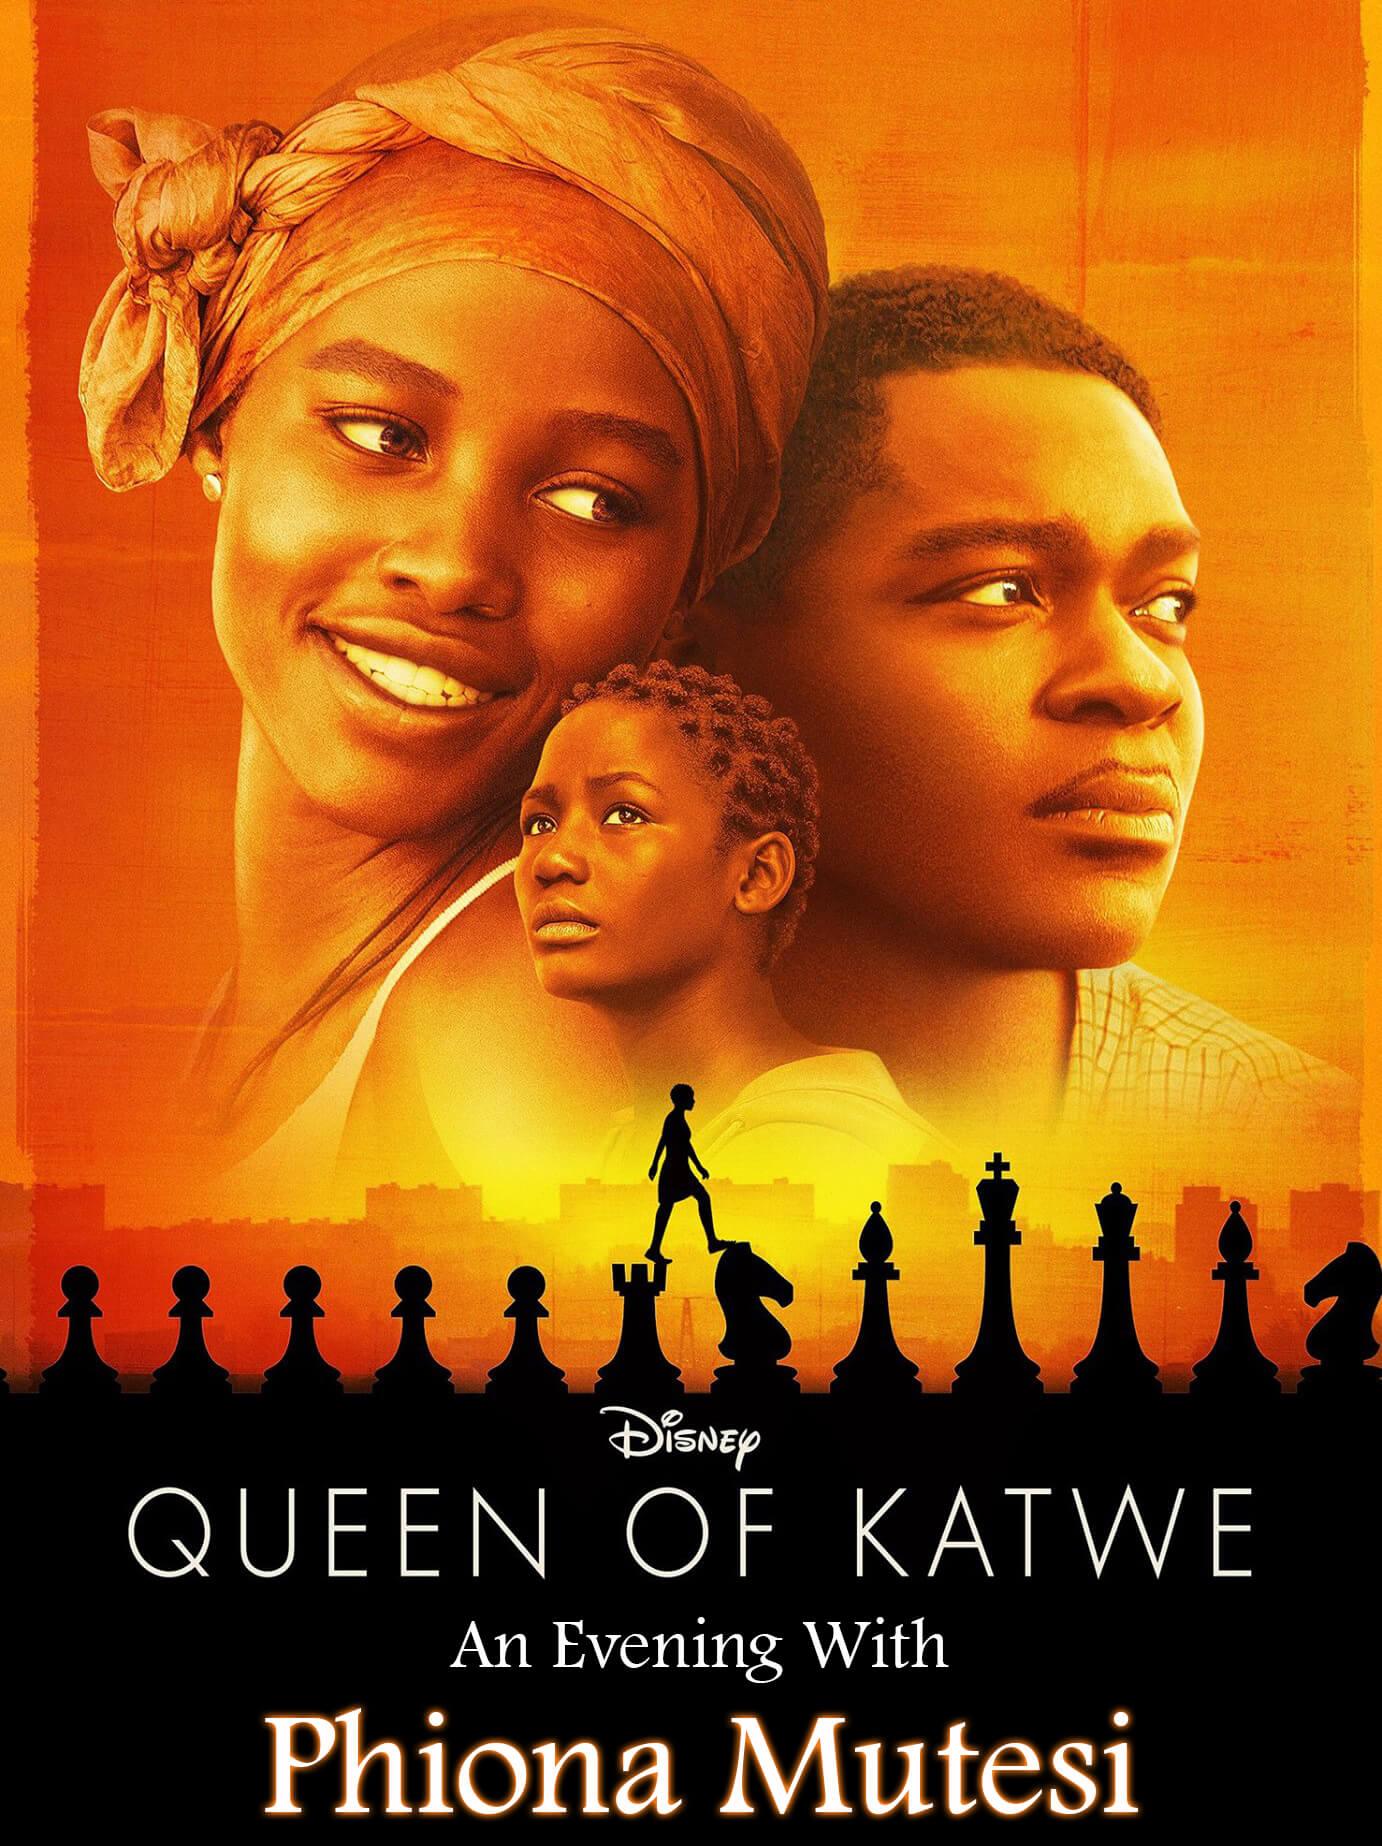 PhenoaMutesiQueen-of-Katwe-poster-2